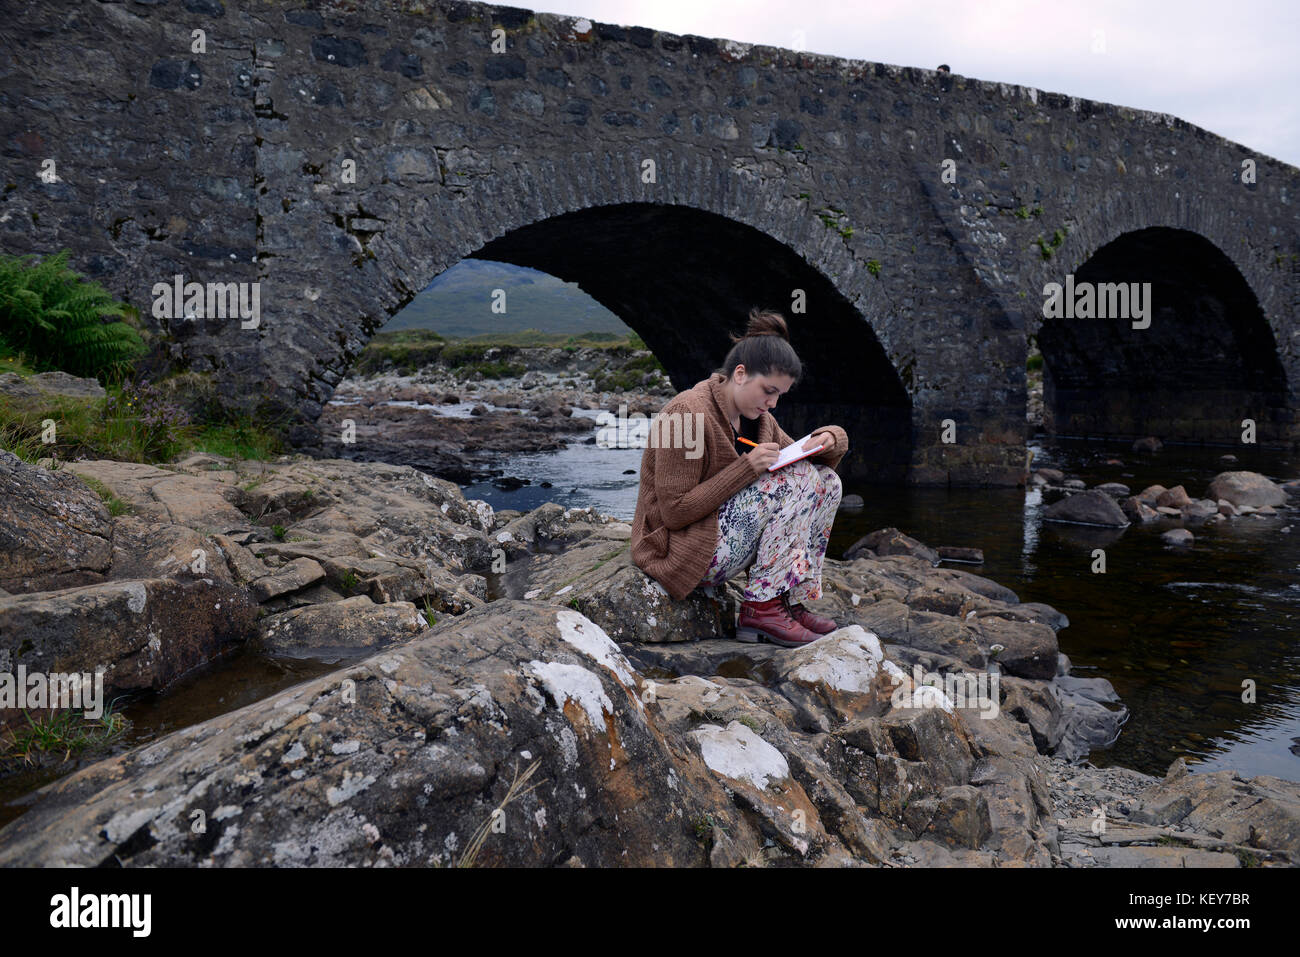 17 year old girl writes in her journal at old stone bridge over River Slichagan  Isle of Skye, Scot - Stock Image